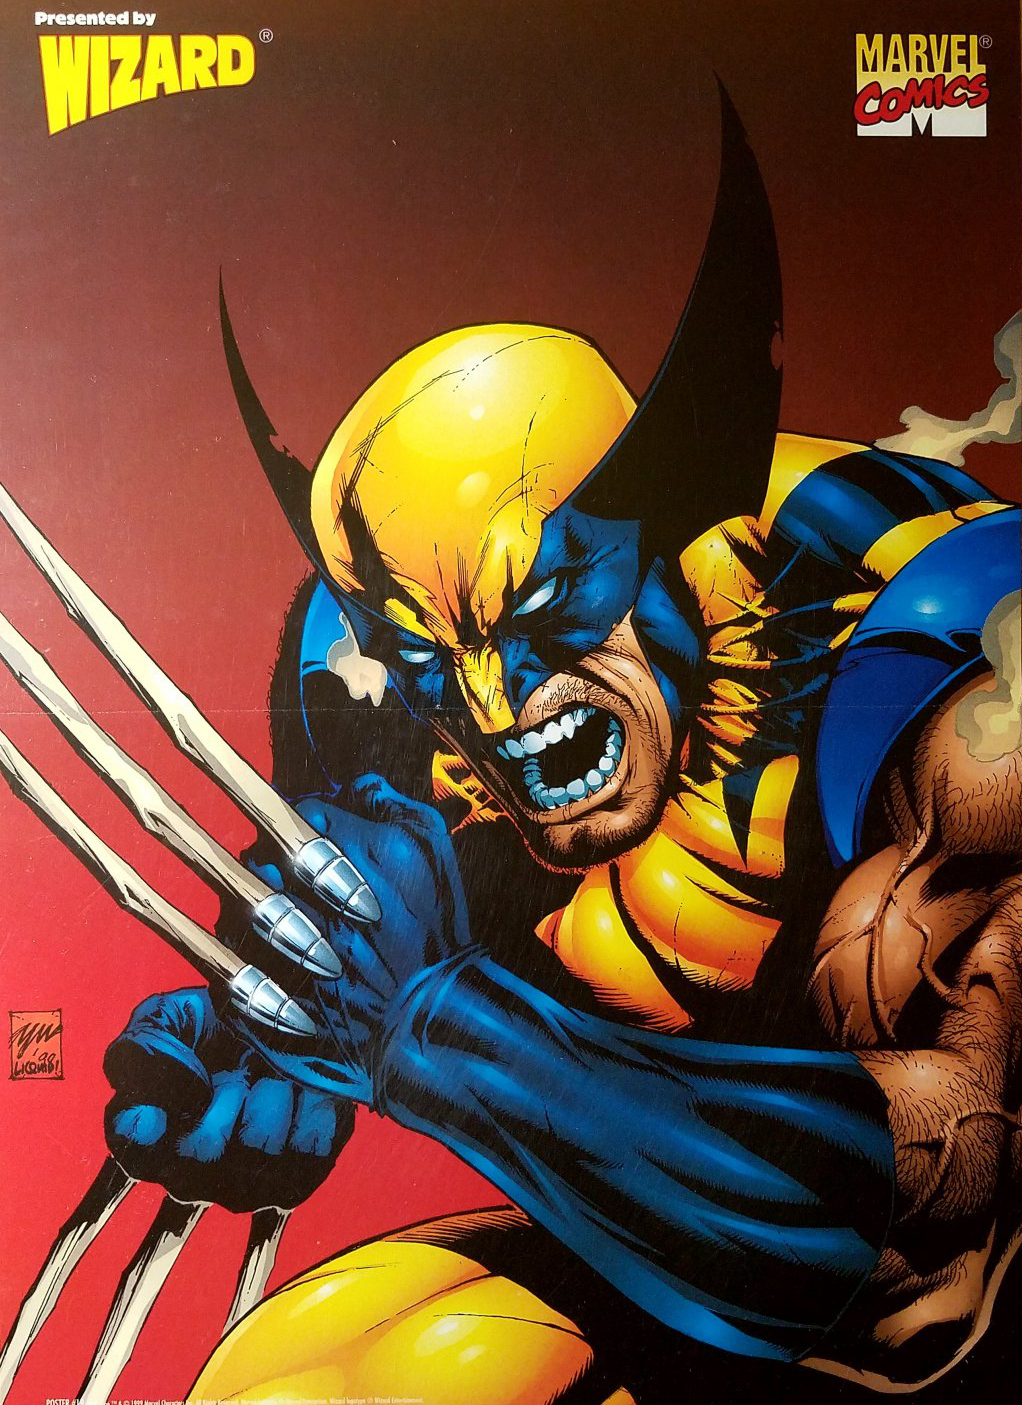 File:Wolverine-newpic.jpg